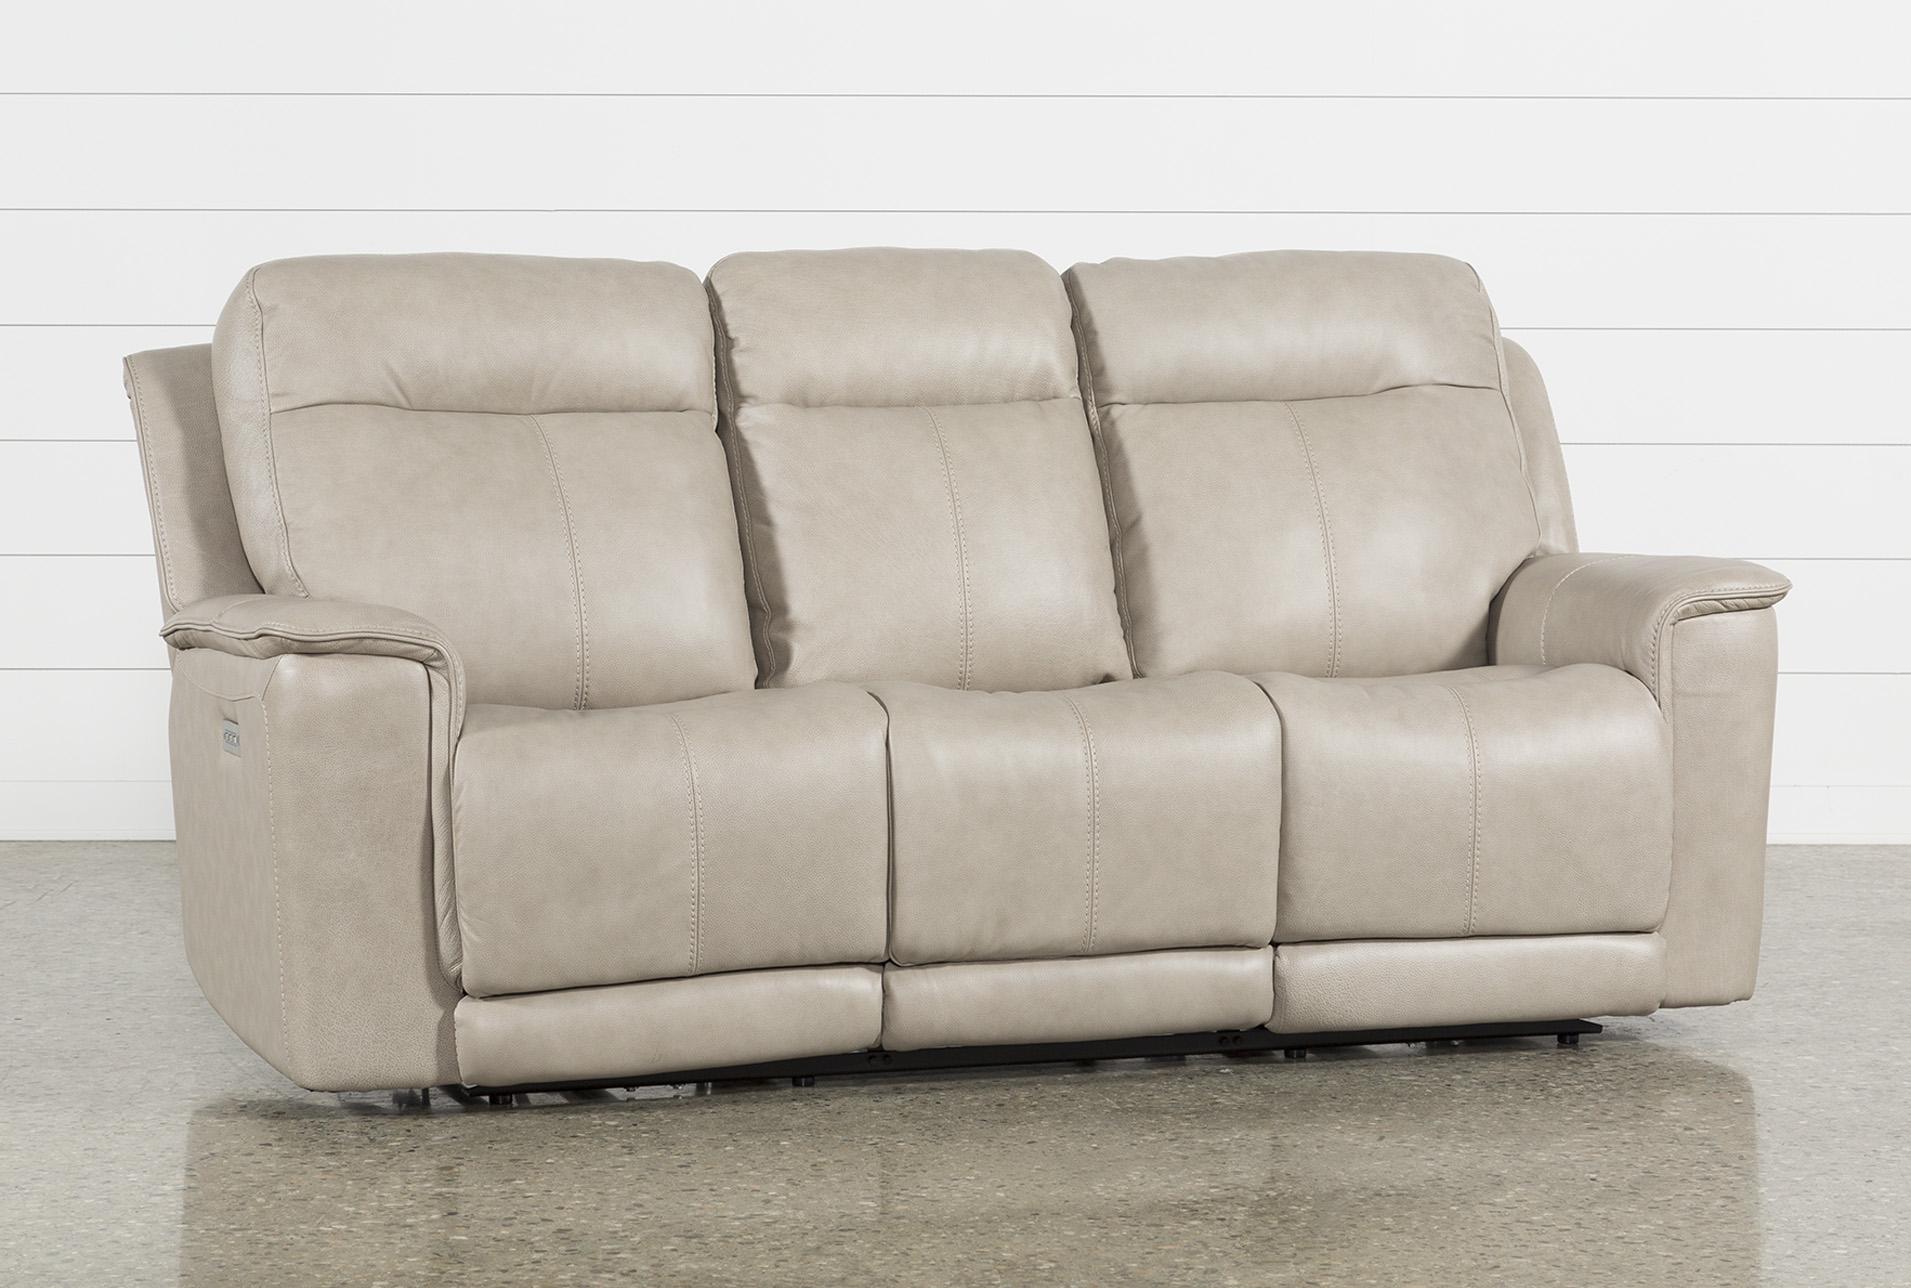 Walsh Dove Power Reclining Sofa W/Power Headrest, Lumbar U0026 Usb